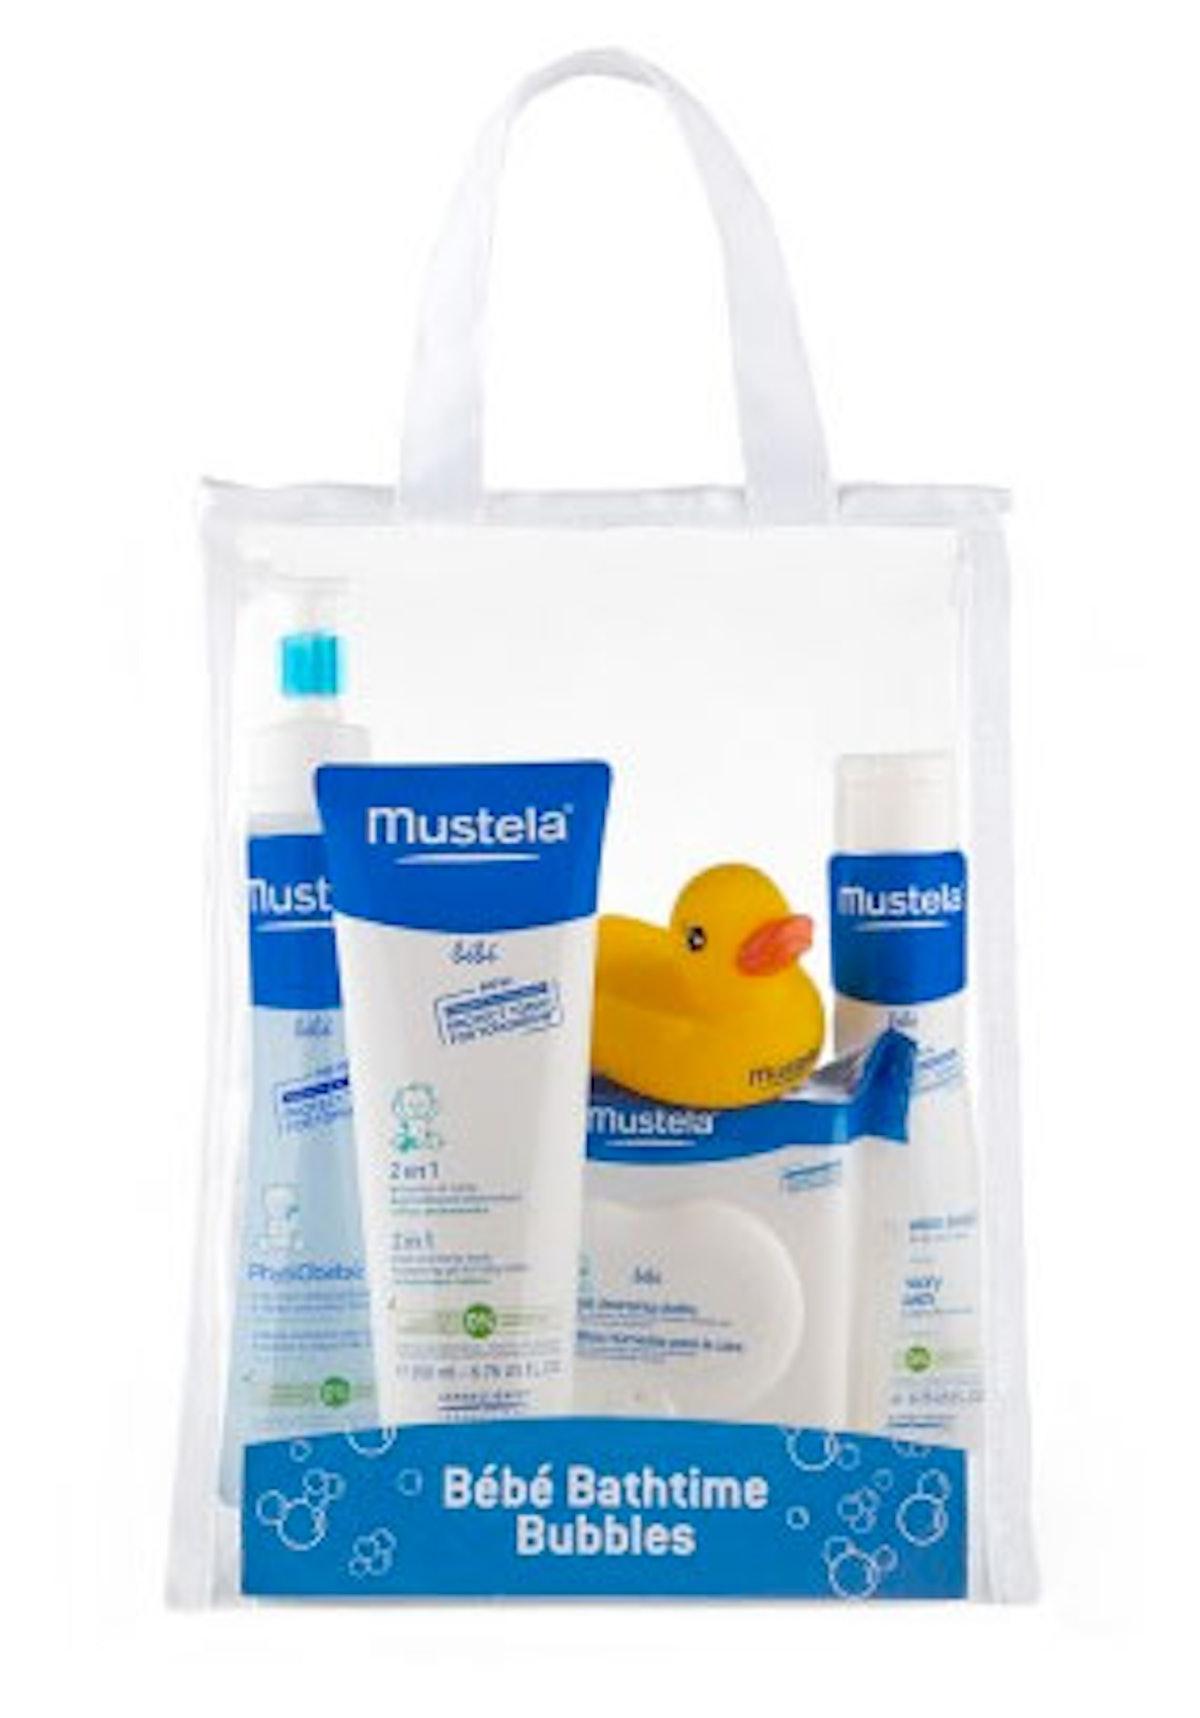 Mustela Baby Care